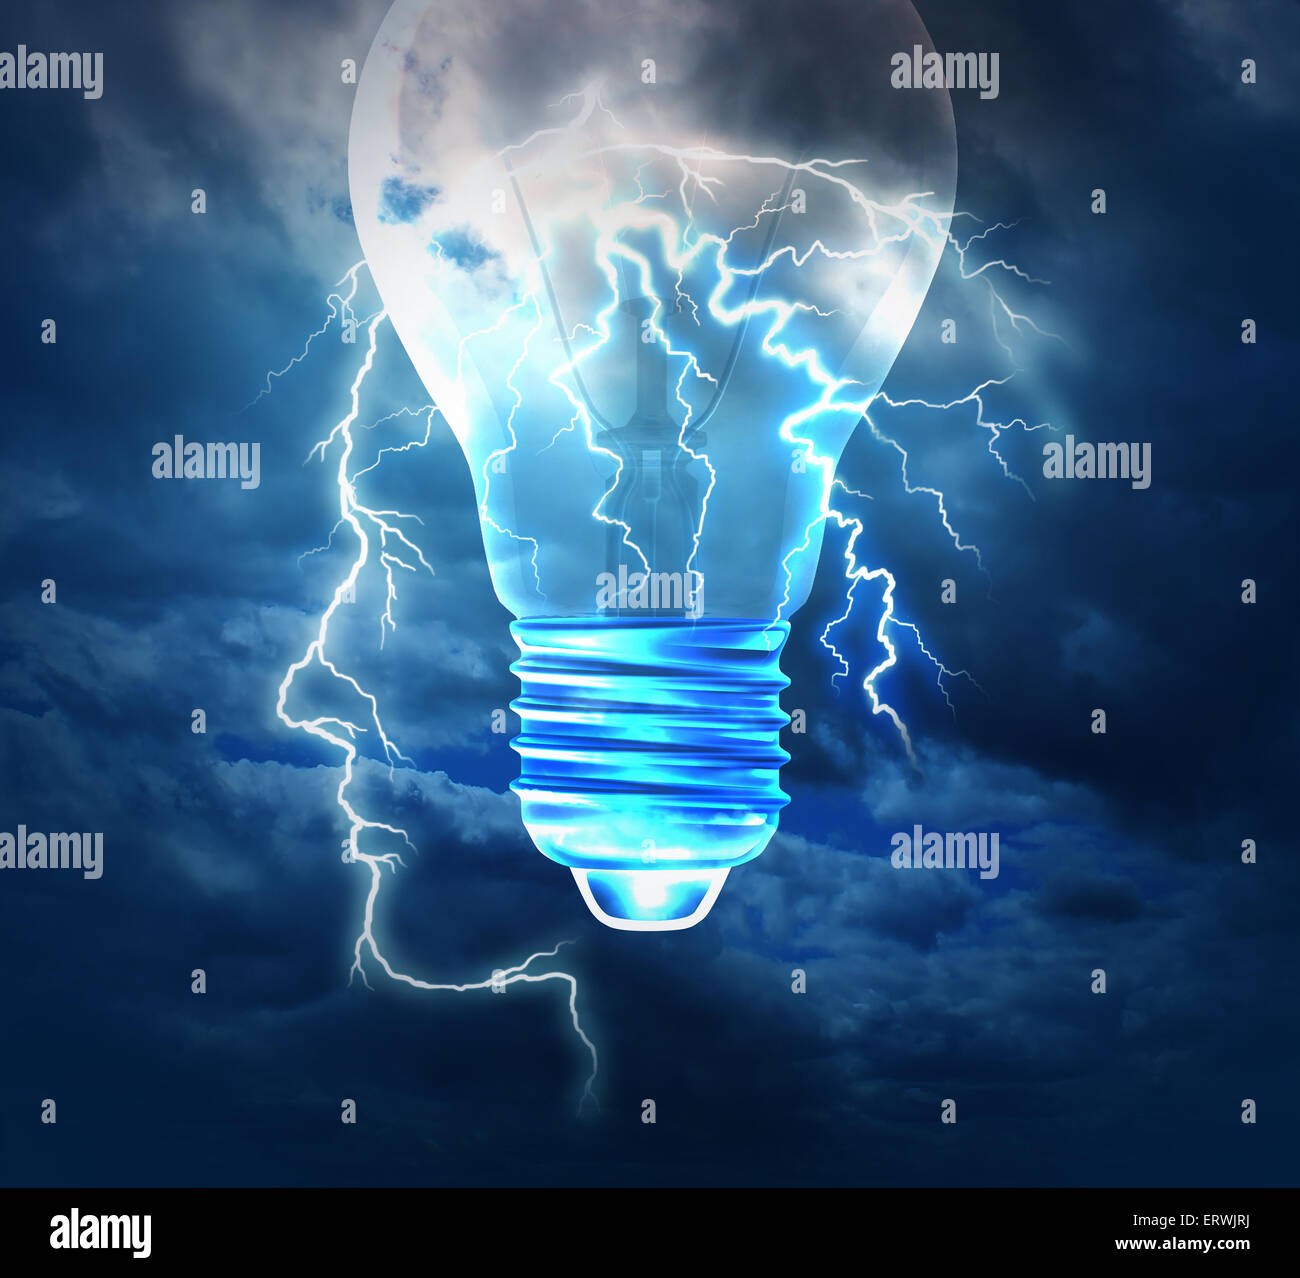 brainstorm creative idea concept or brainstorming symbol as a stock